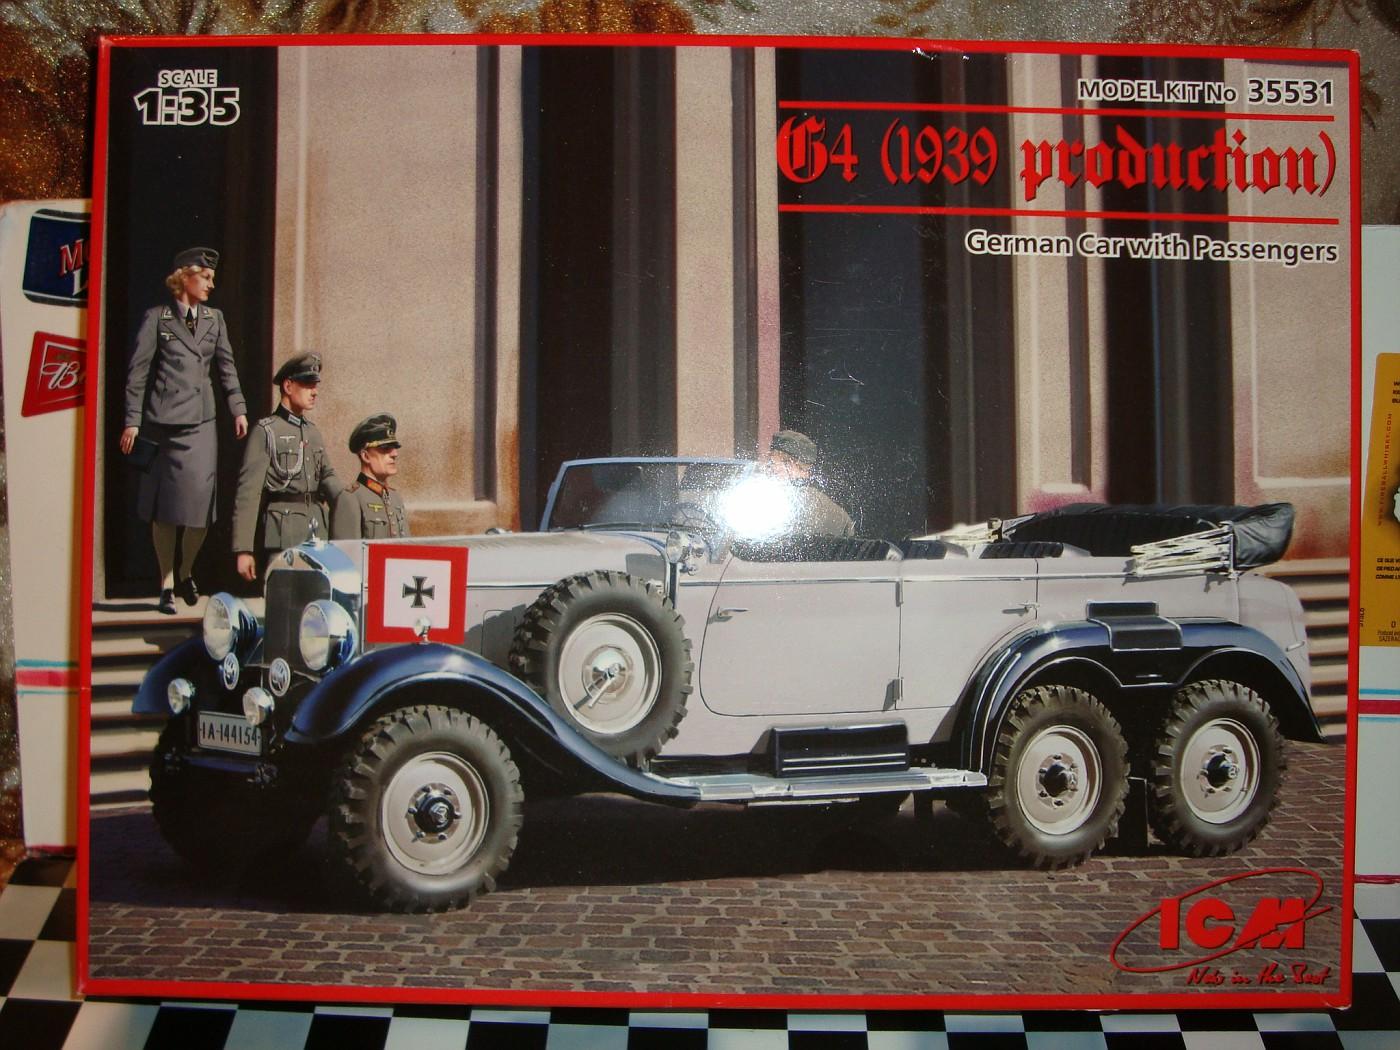 Daimier-Benz G4 German Staff Car 1939 001-vi